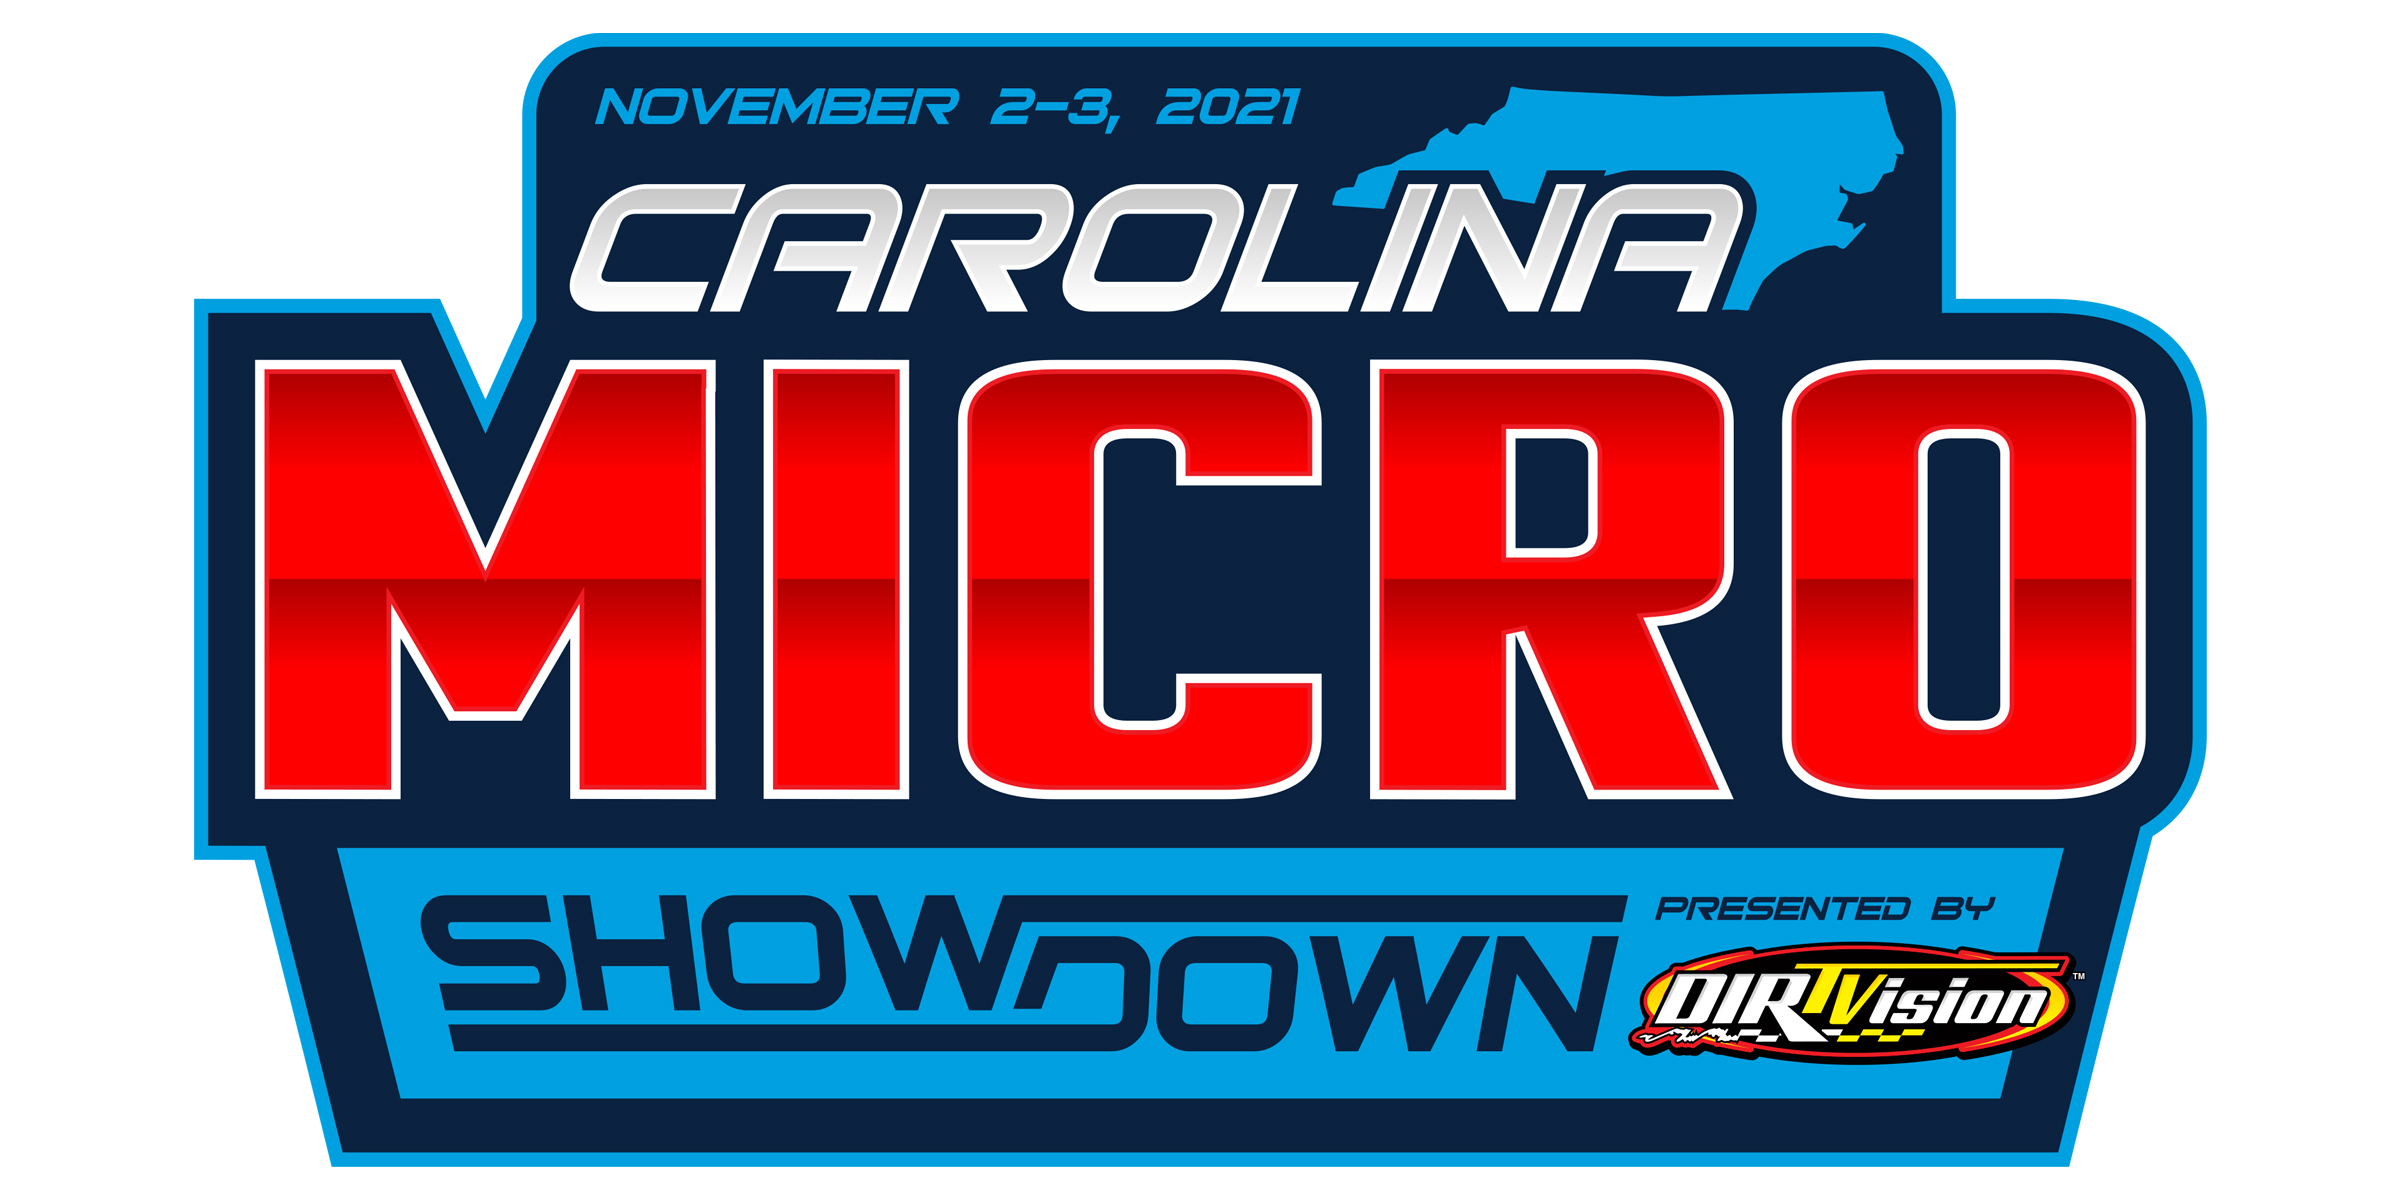 Carolina Micro Showdown race information